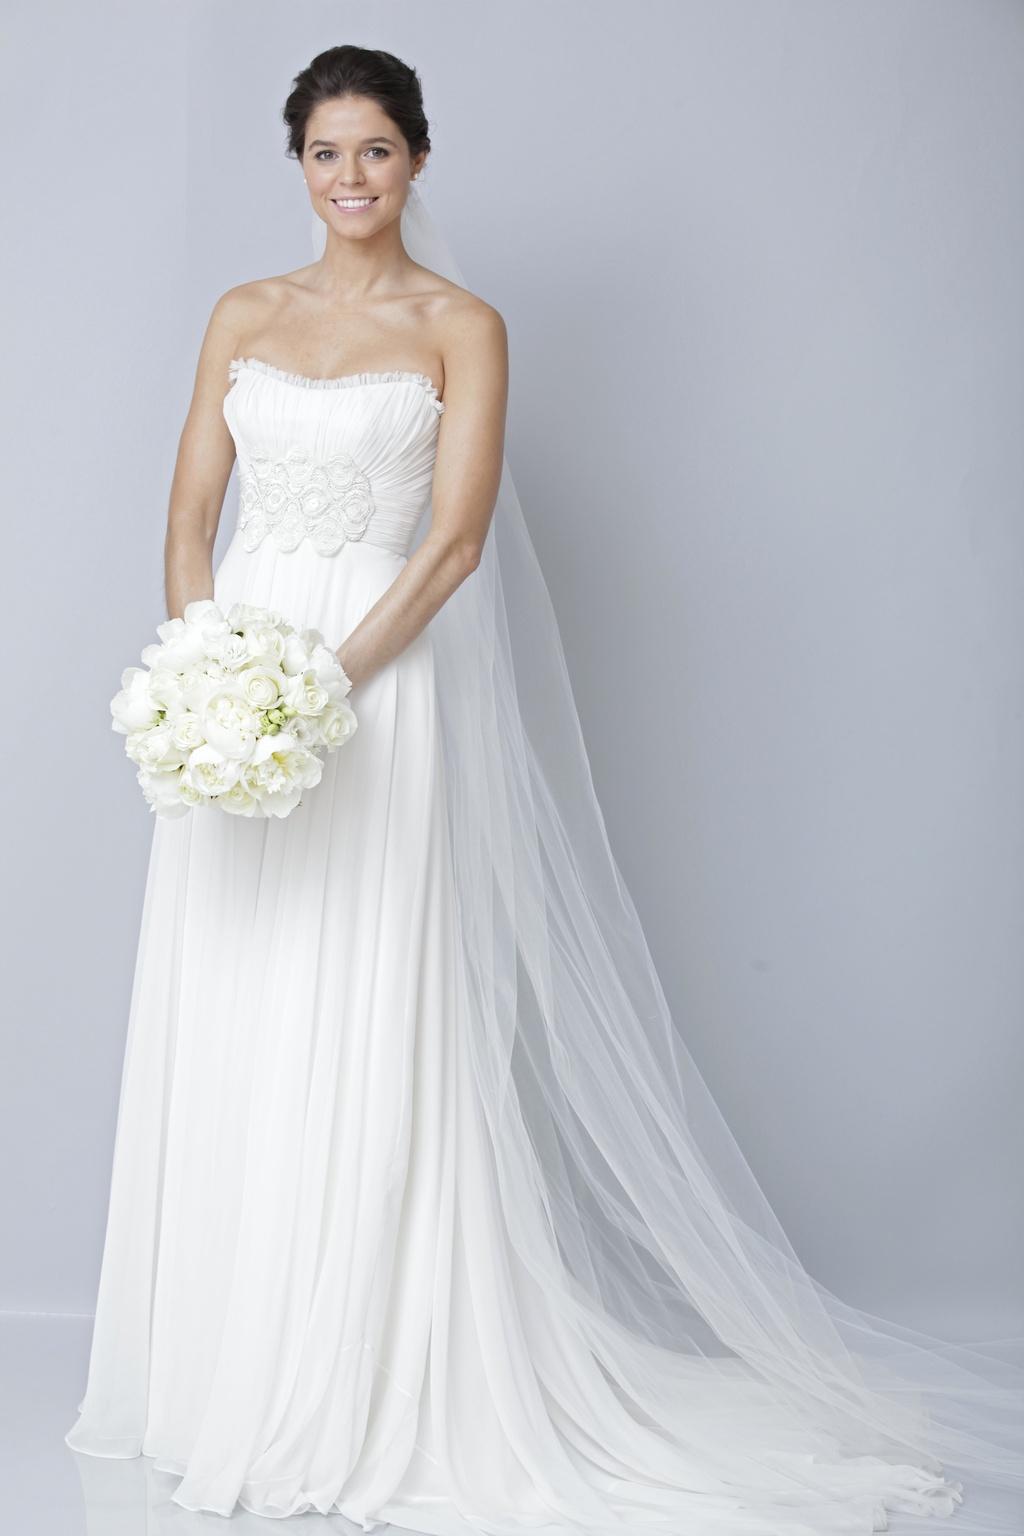 2013-wedding-dress-by-theia-bridal-gowns-strapless-sheath.full